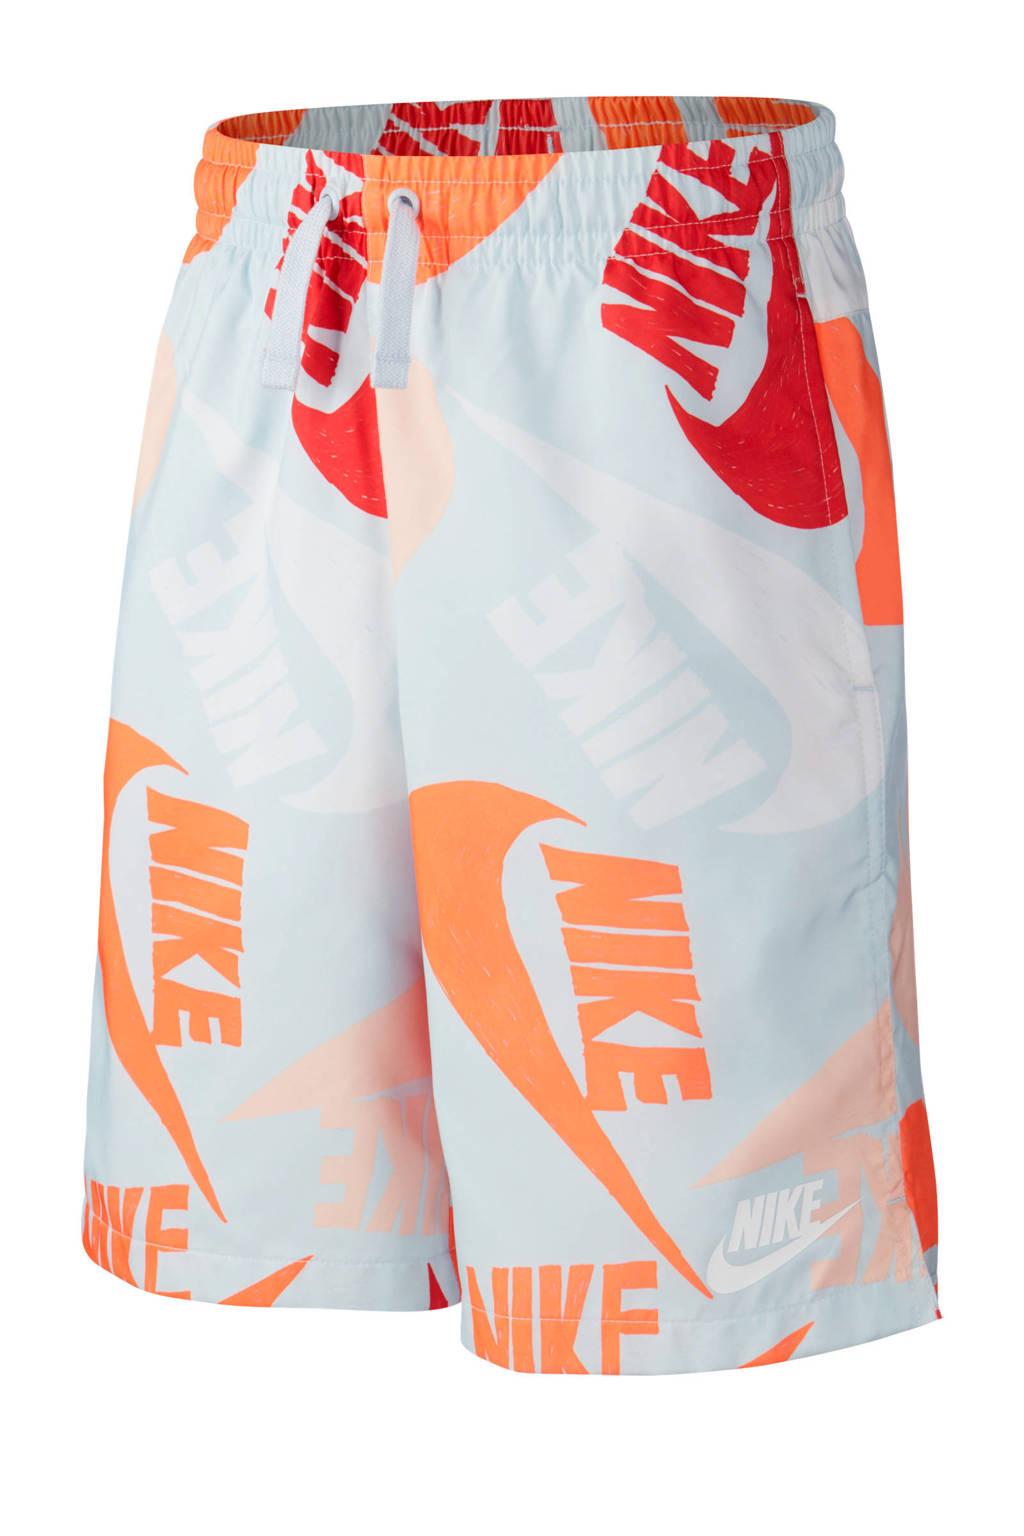 Nike   short wit/oranje/rood